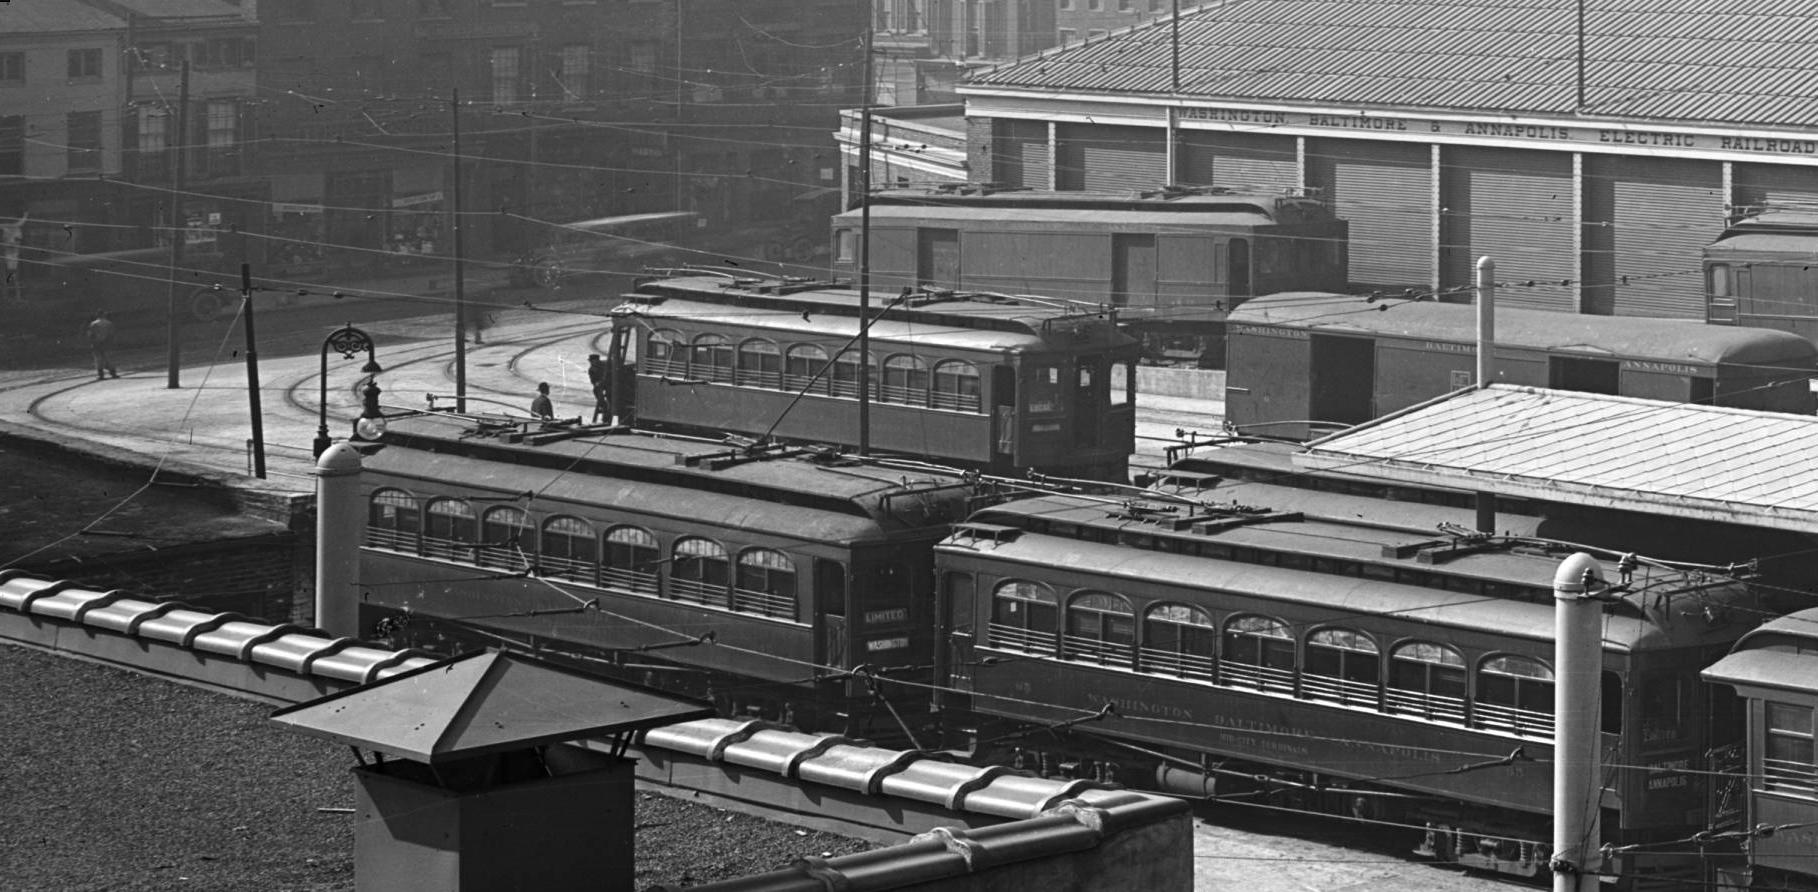 Washington-Baltimore-and-Annapolis-Railroad-Baltimore-13.jpg